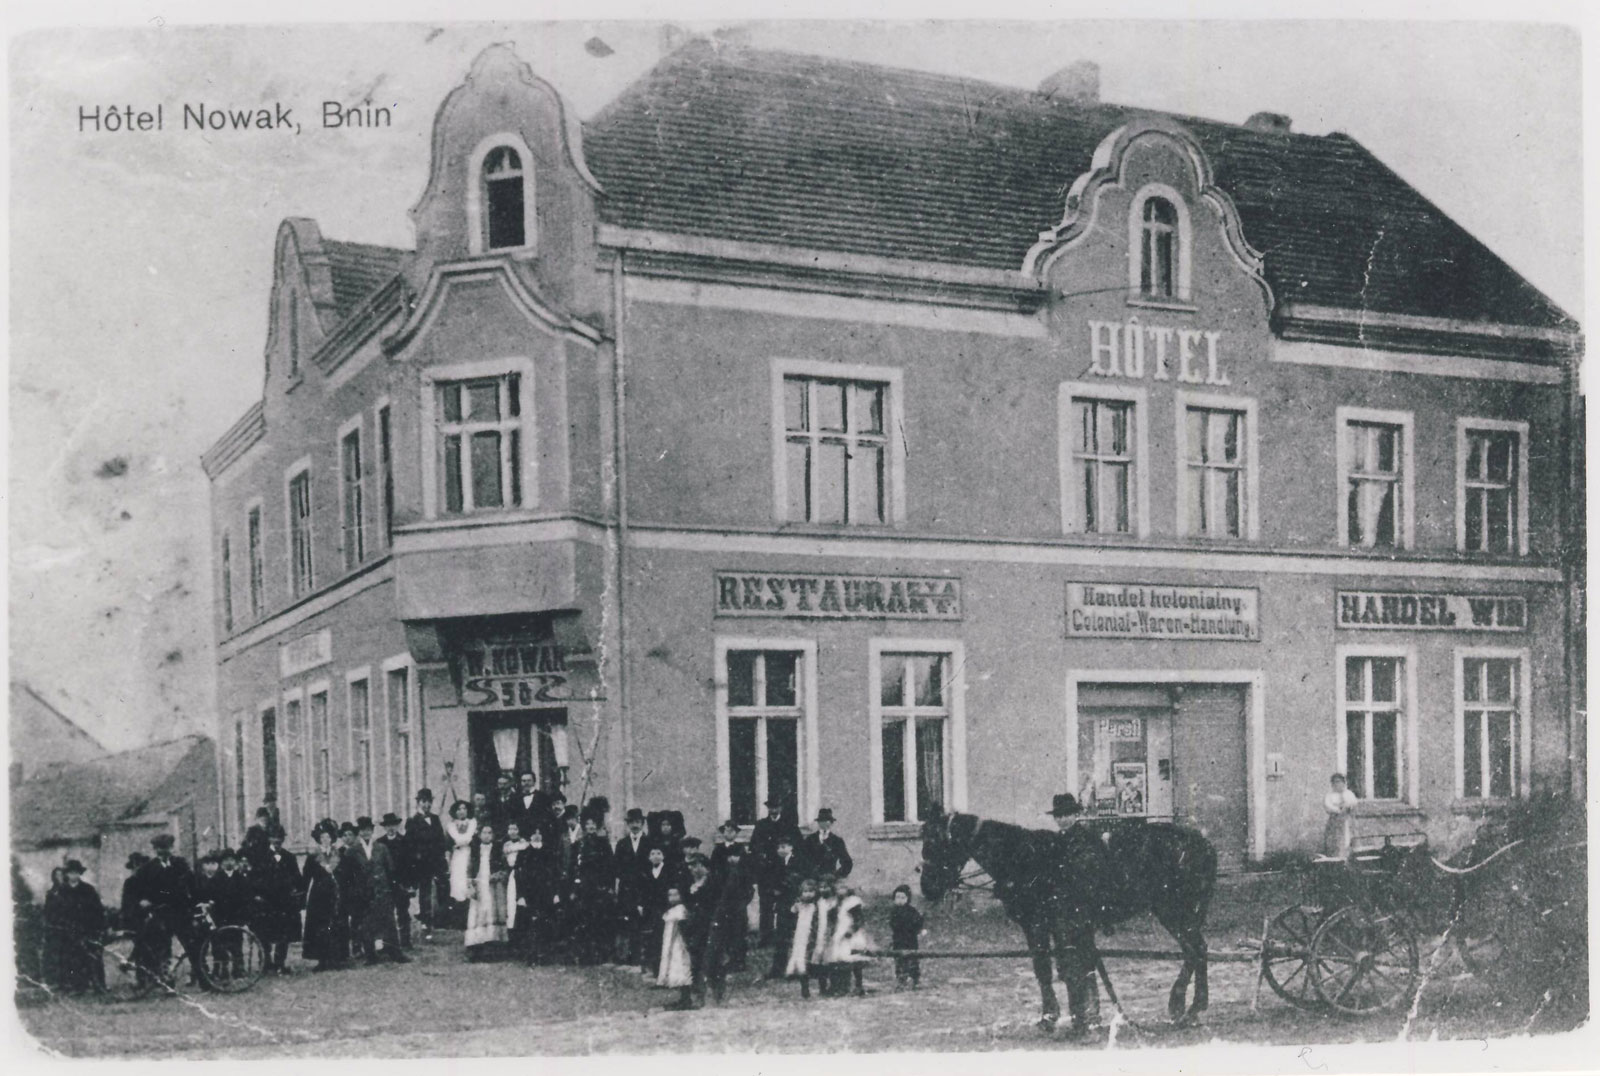 Hotel Nowak – Bnin